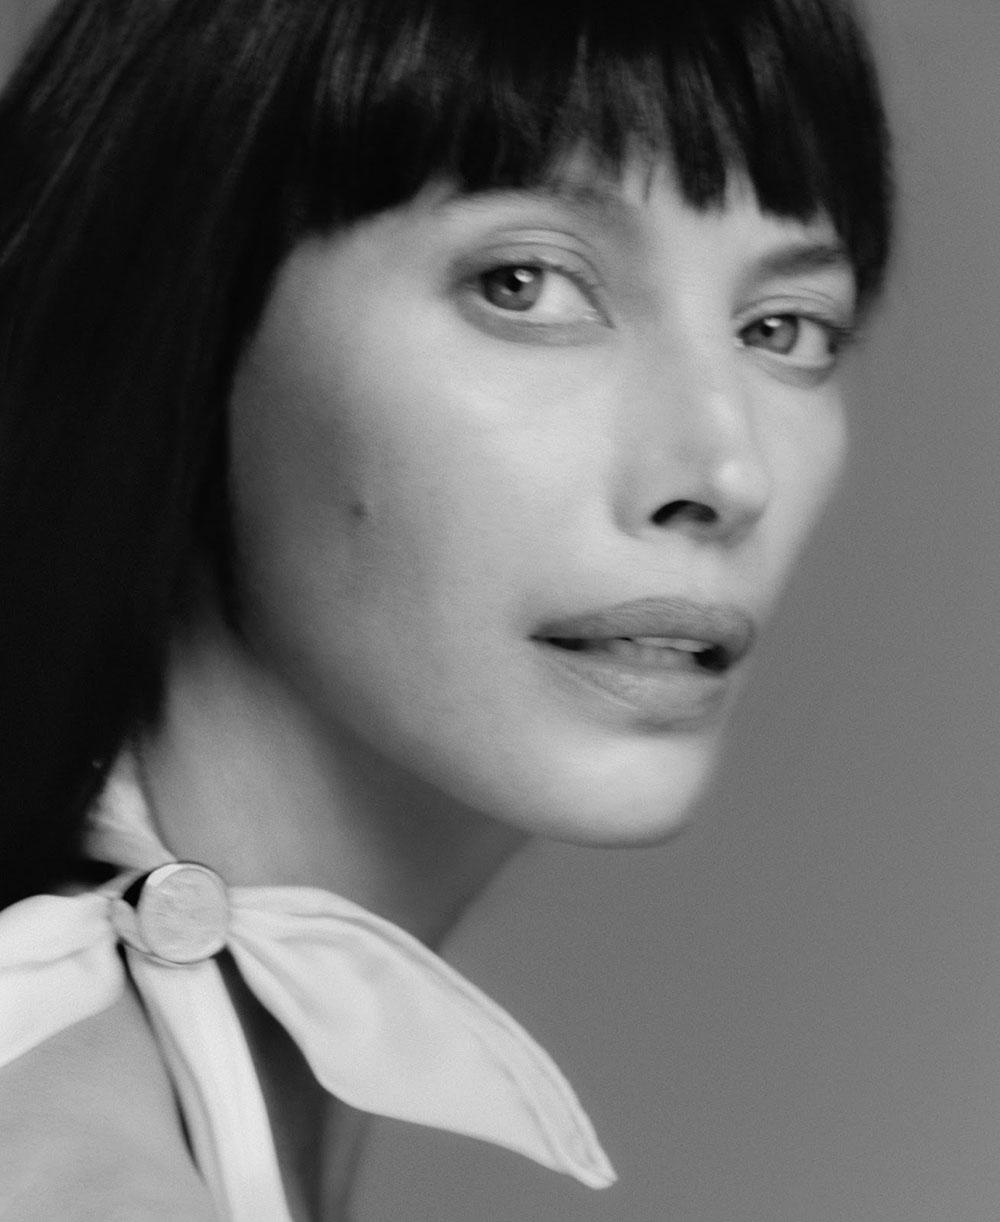 Christy Turlington covers T Magazine Singapore April 2020 by Chris Colls